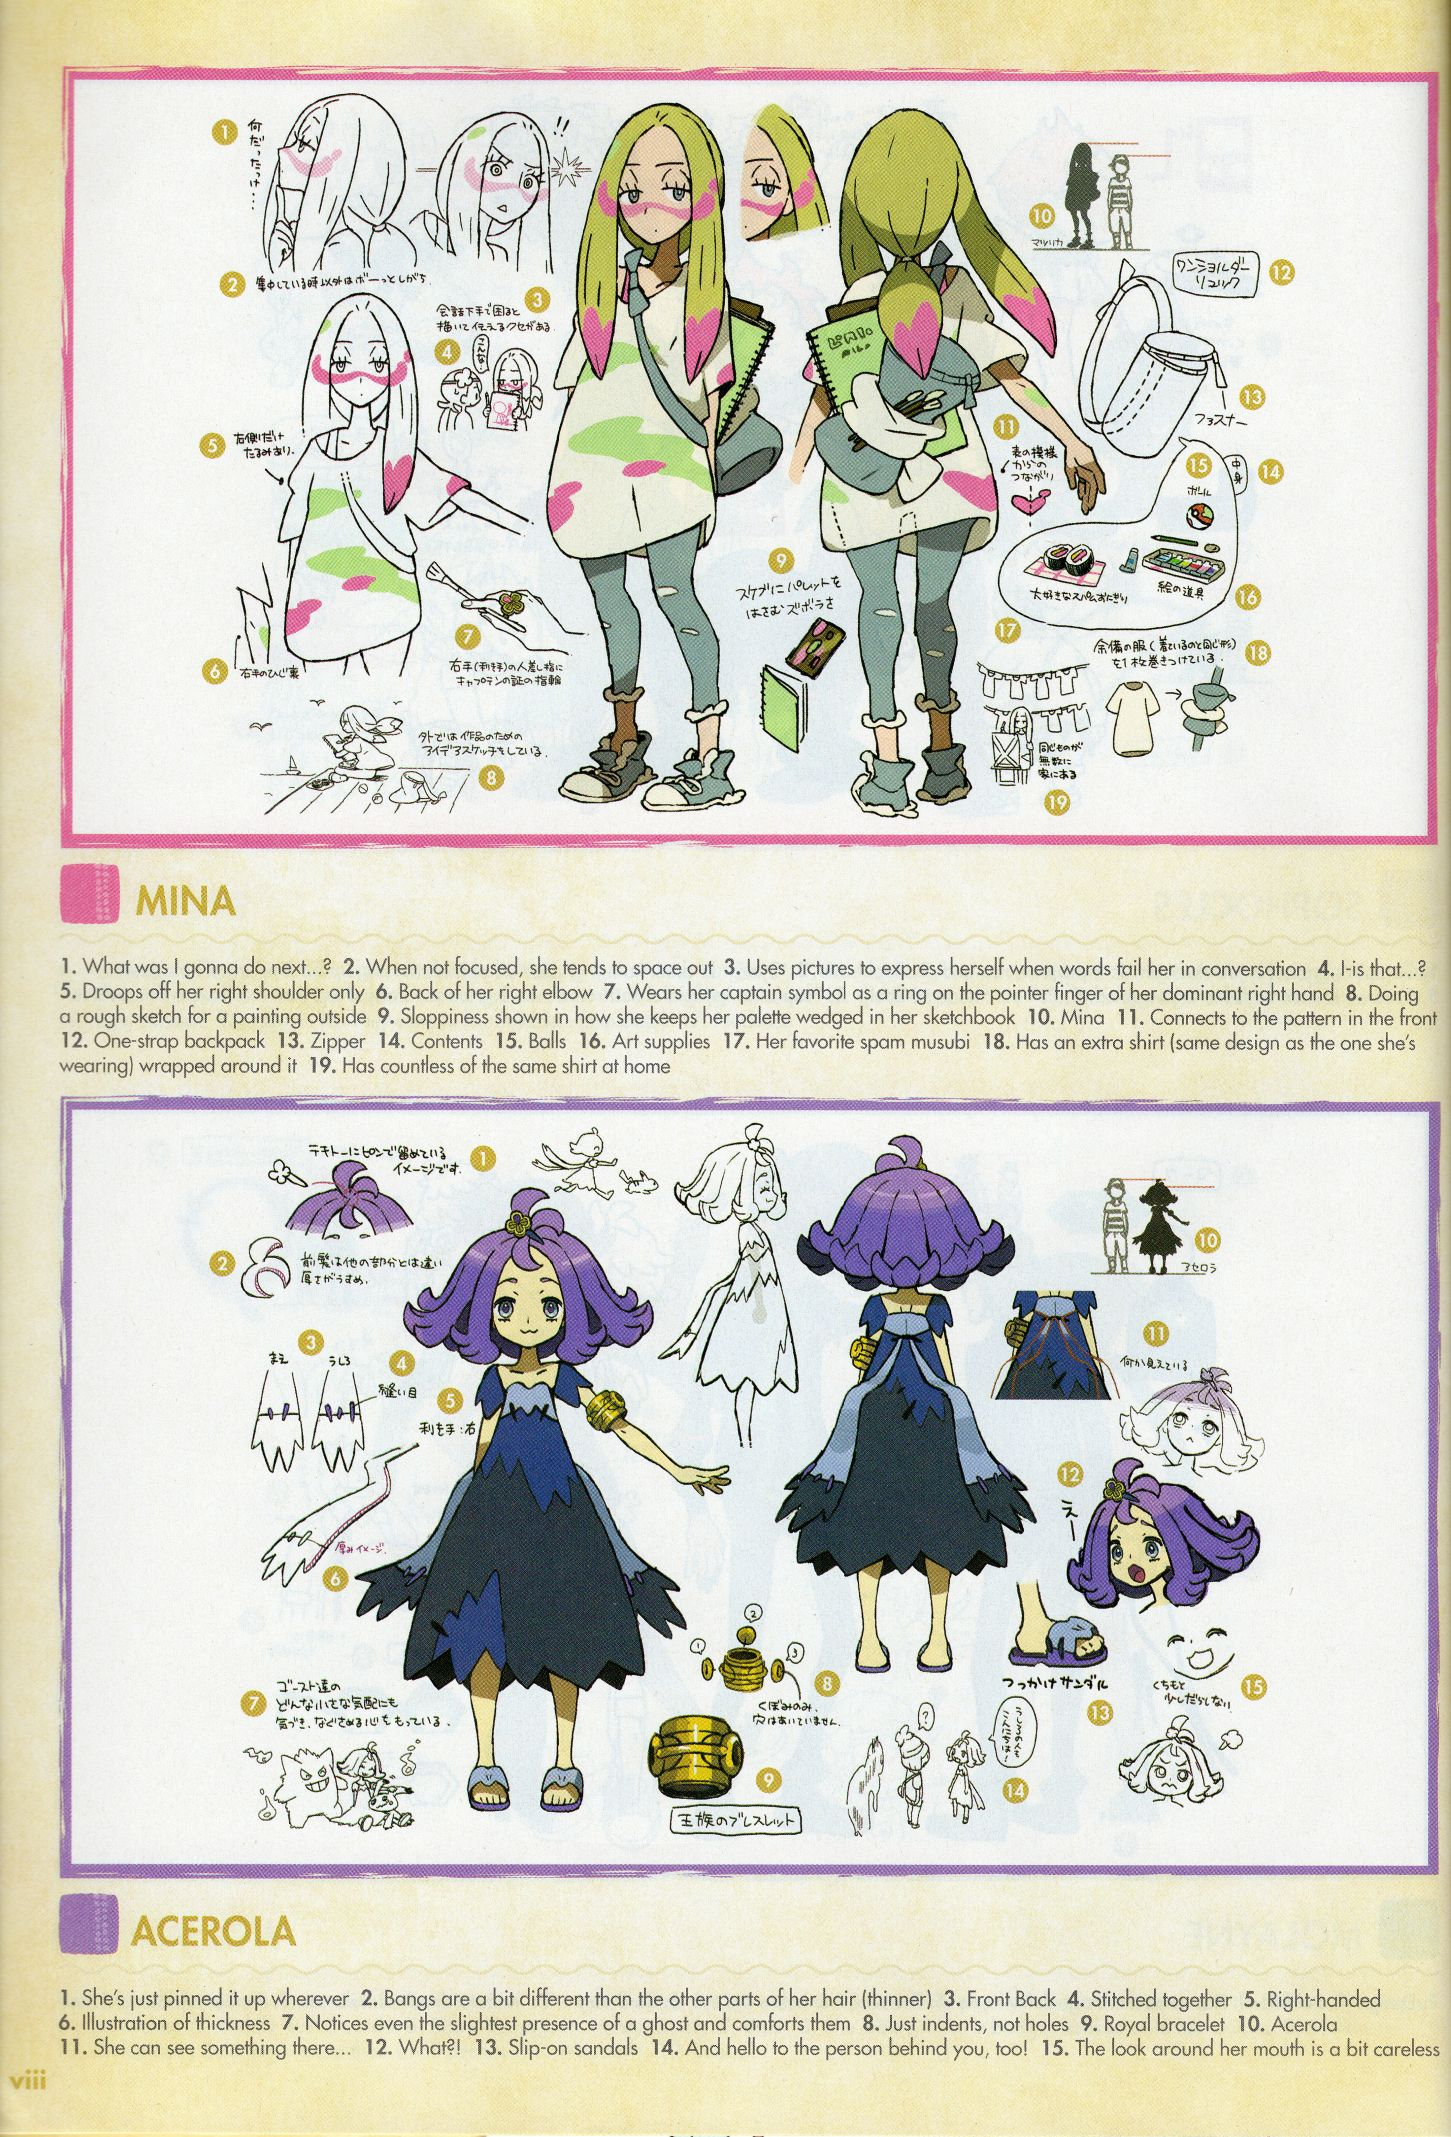 pokémon sun/moon - trial captains mina and acerola | ポケモン